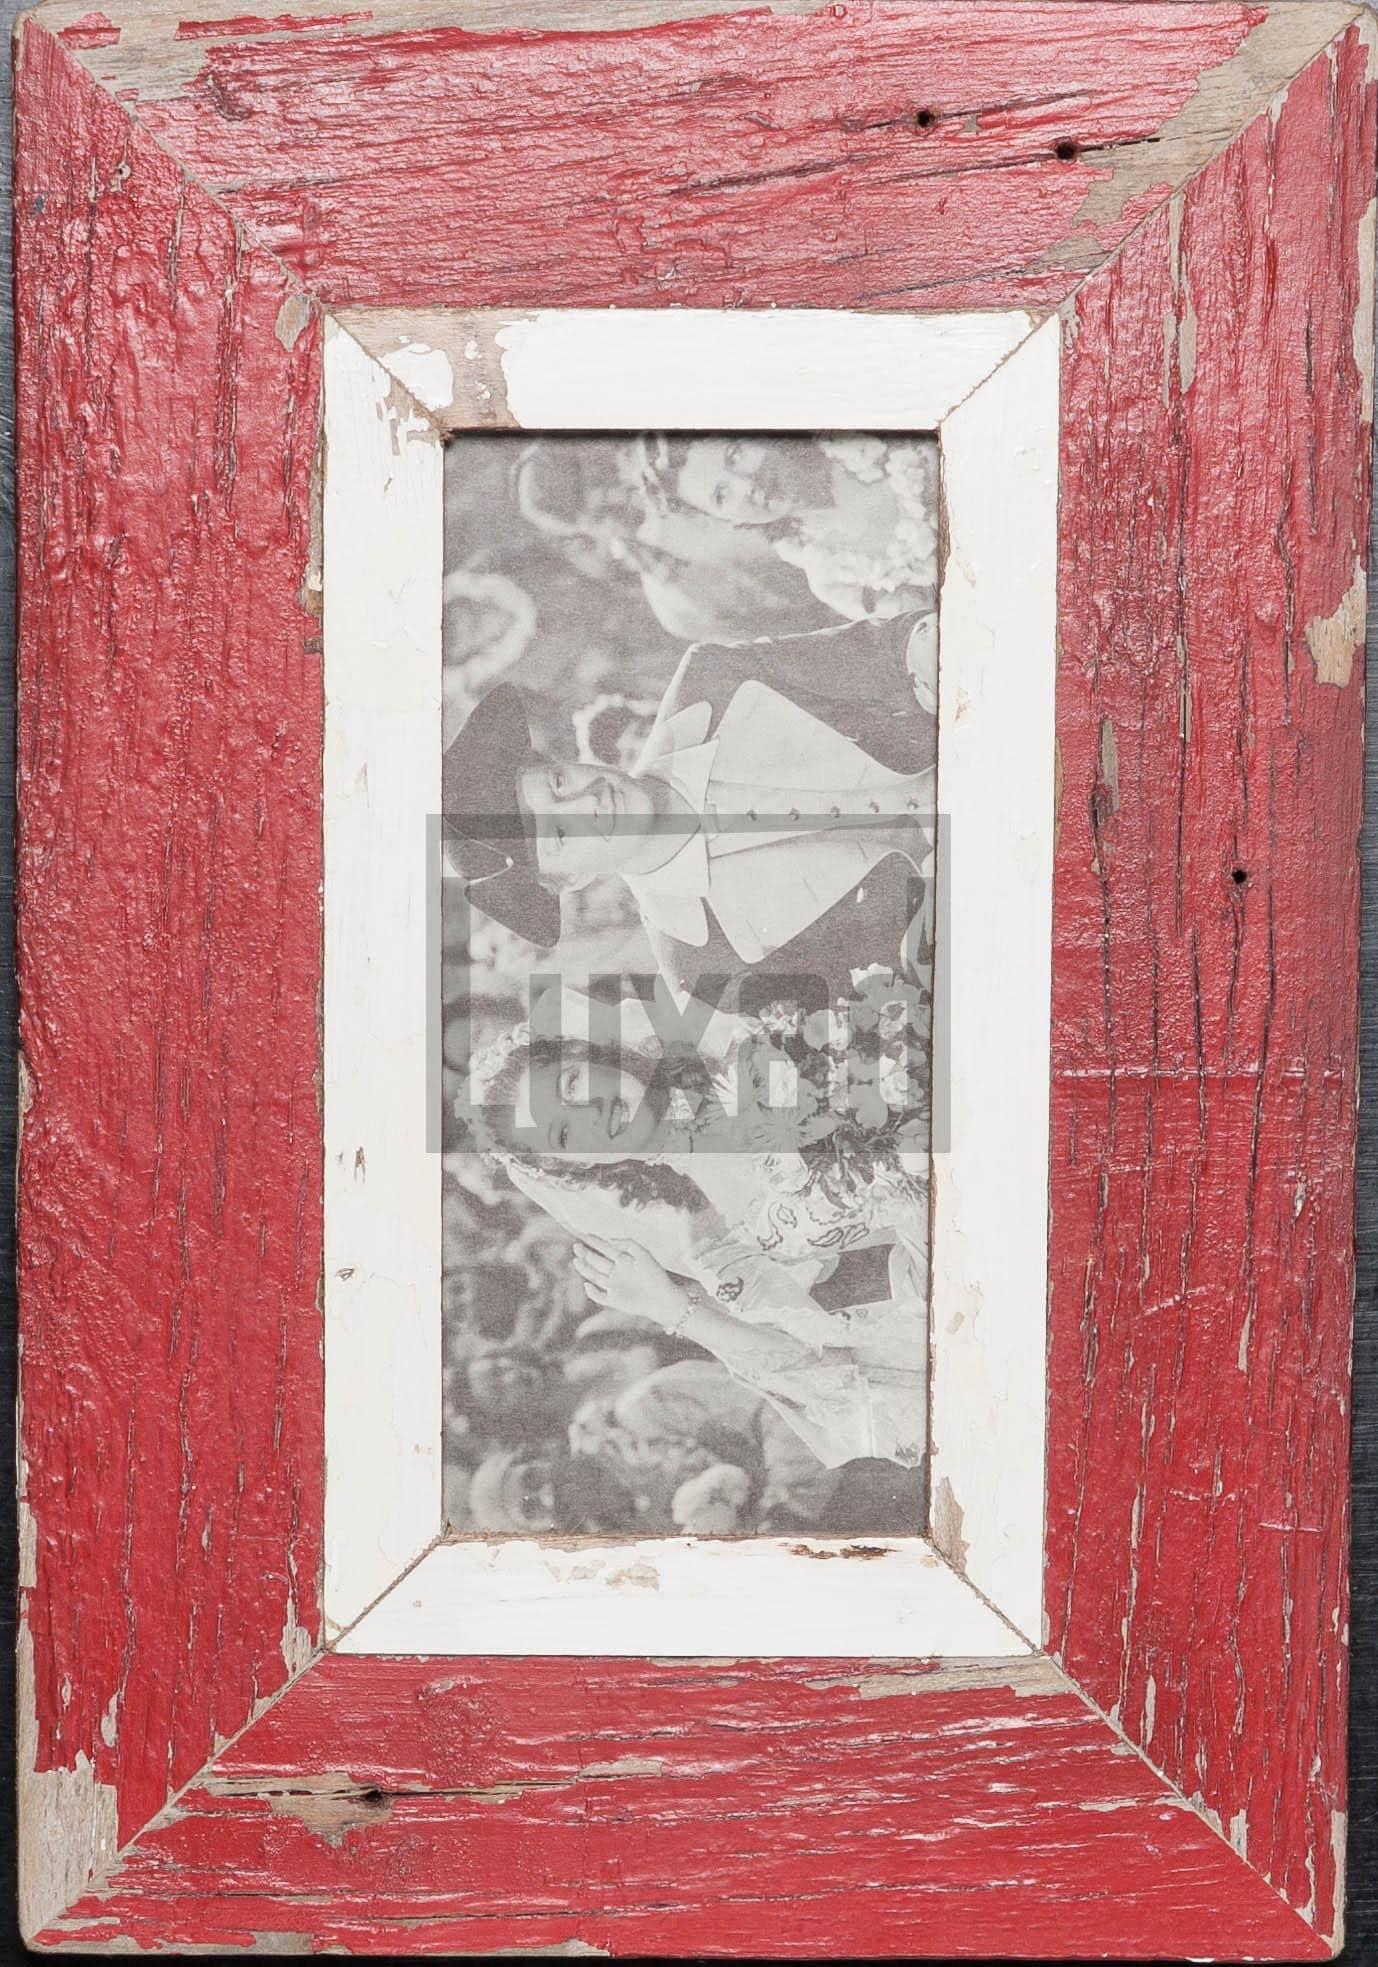 Roter Panorama-Bilderrahmen aus recyceltem Holz für Fotos ca. 10,5 x 29,7 cm